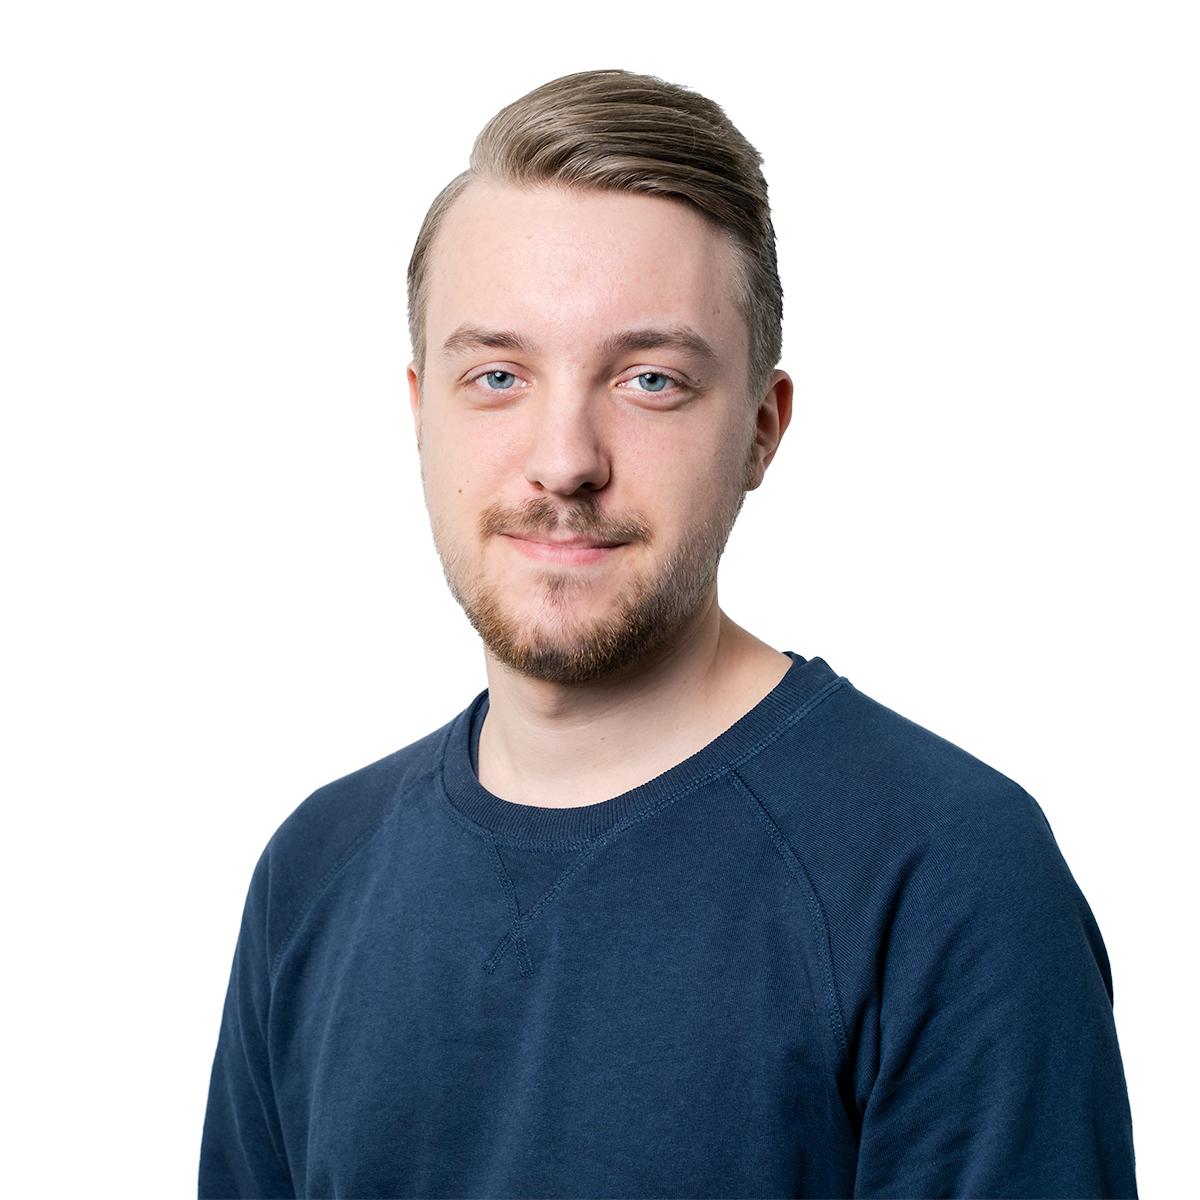 Mattis Abrahamsson